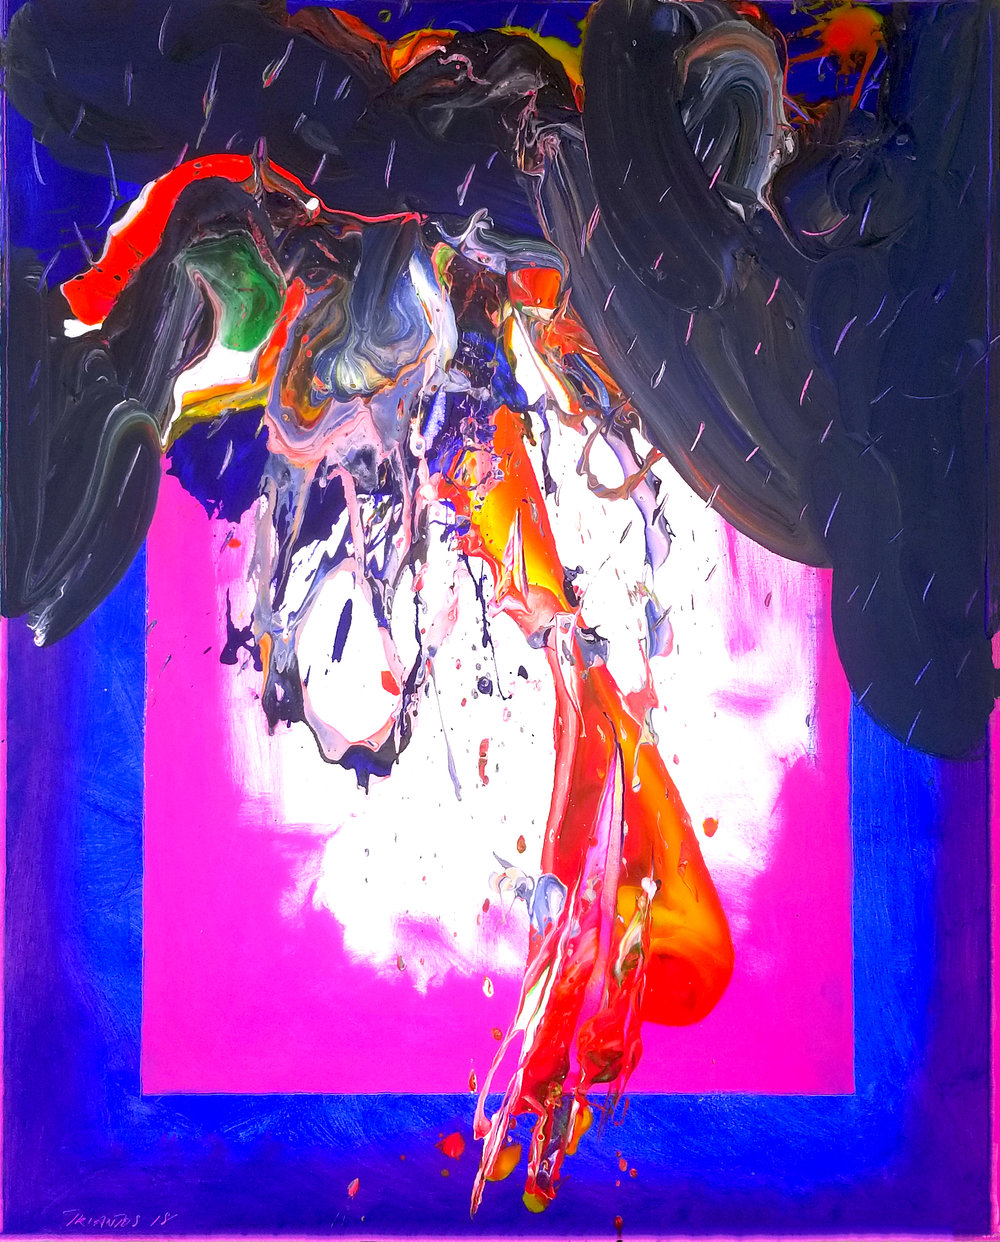 "Storm #5, 2018, acrylic on canvas, 60"" x 48"" (152.4 x 121.92 cm)"